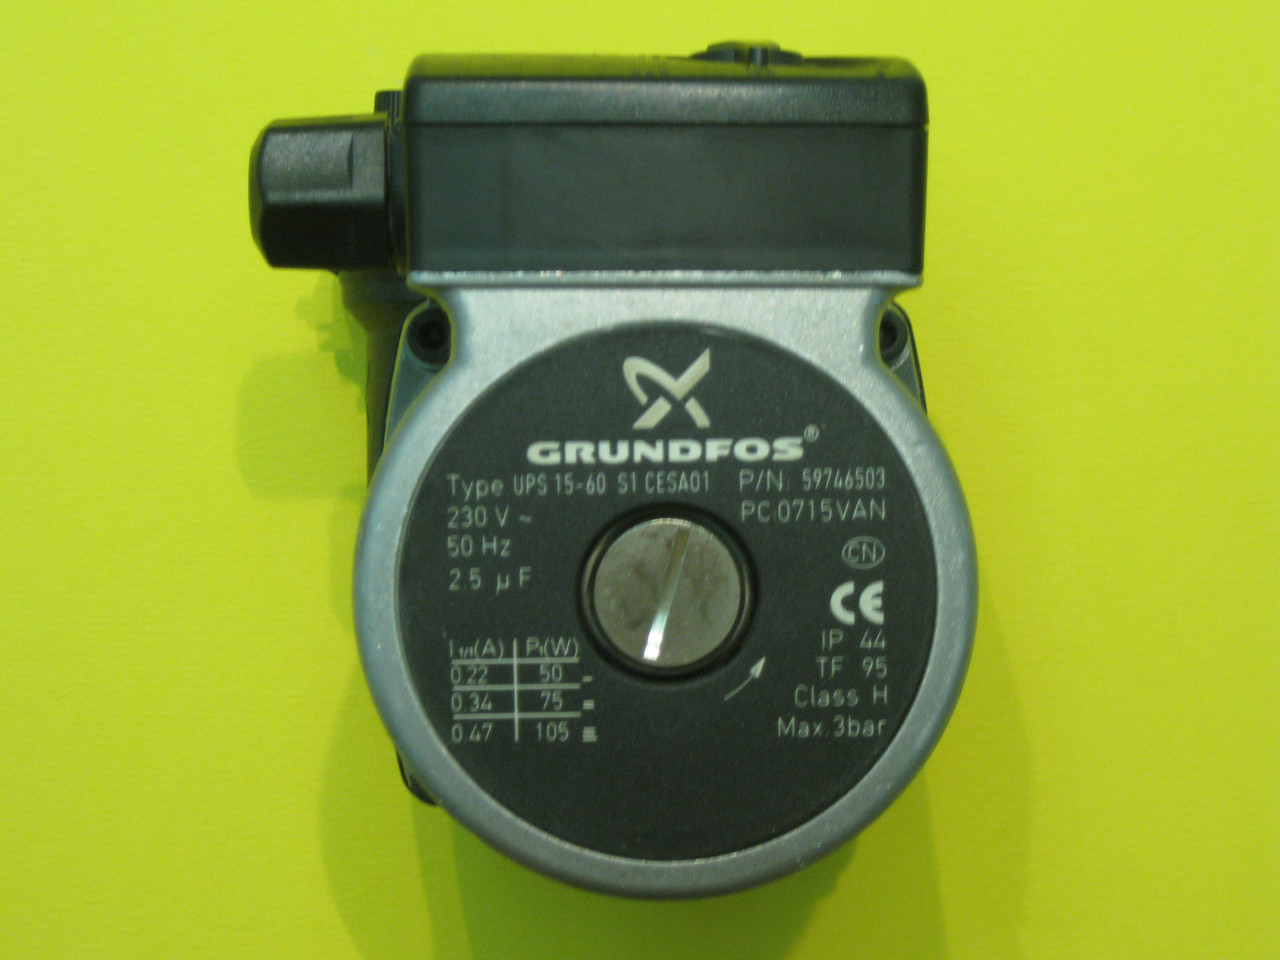 Насос Grundfos UPS 15-60 Rens, Weller